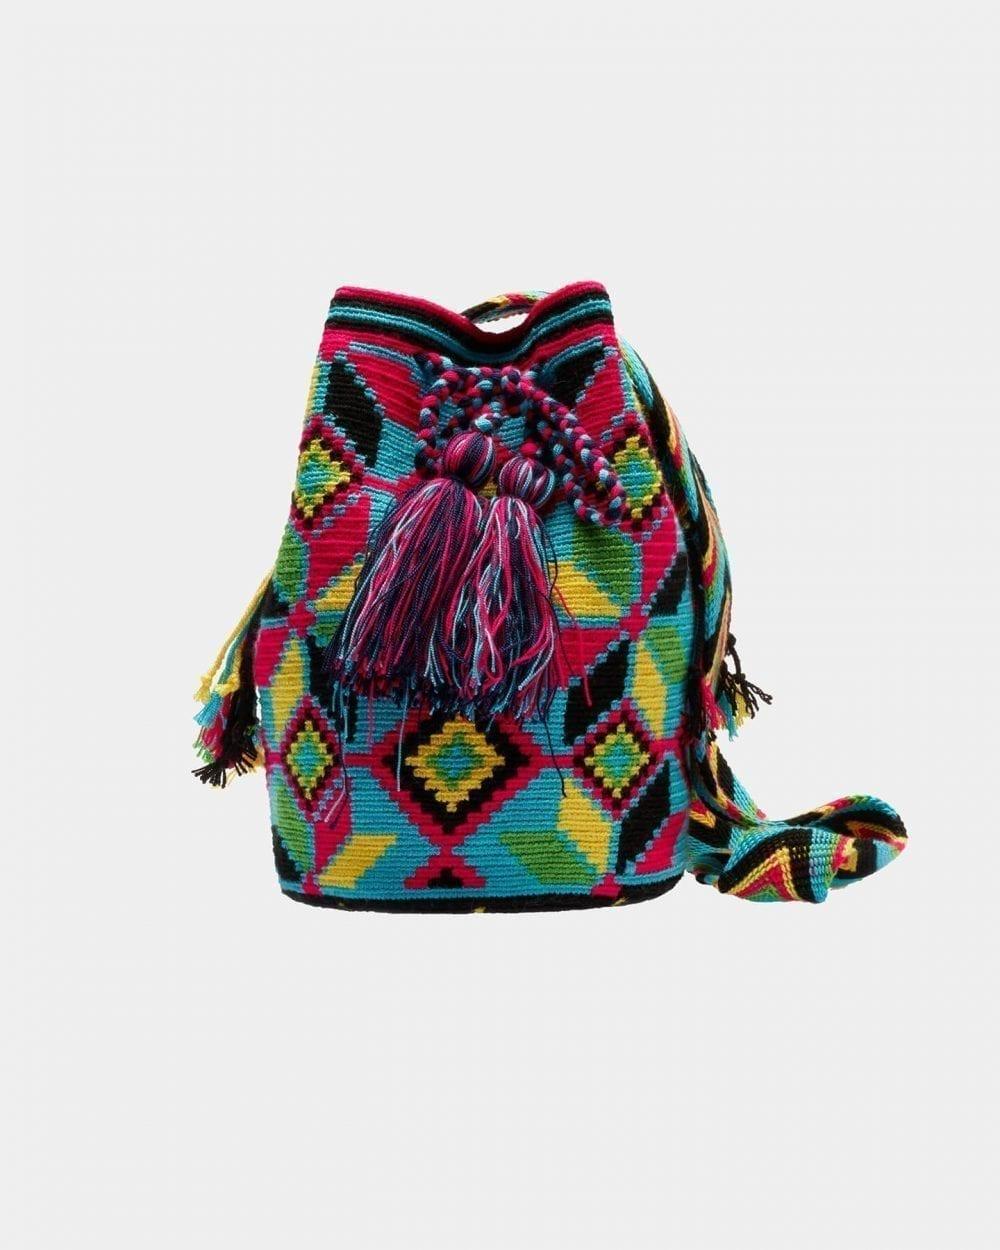 Lea Turquoise shoulder bag by ALLBYB Design, Philadelphia